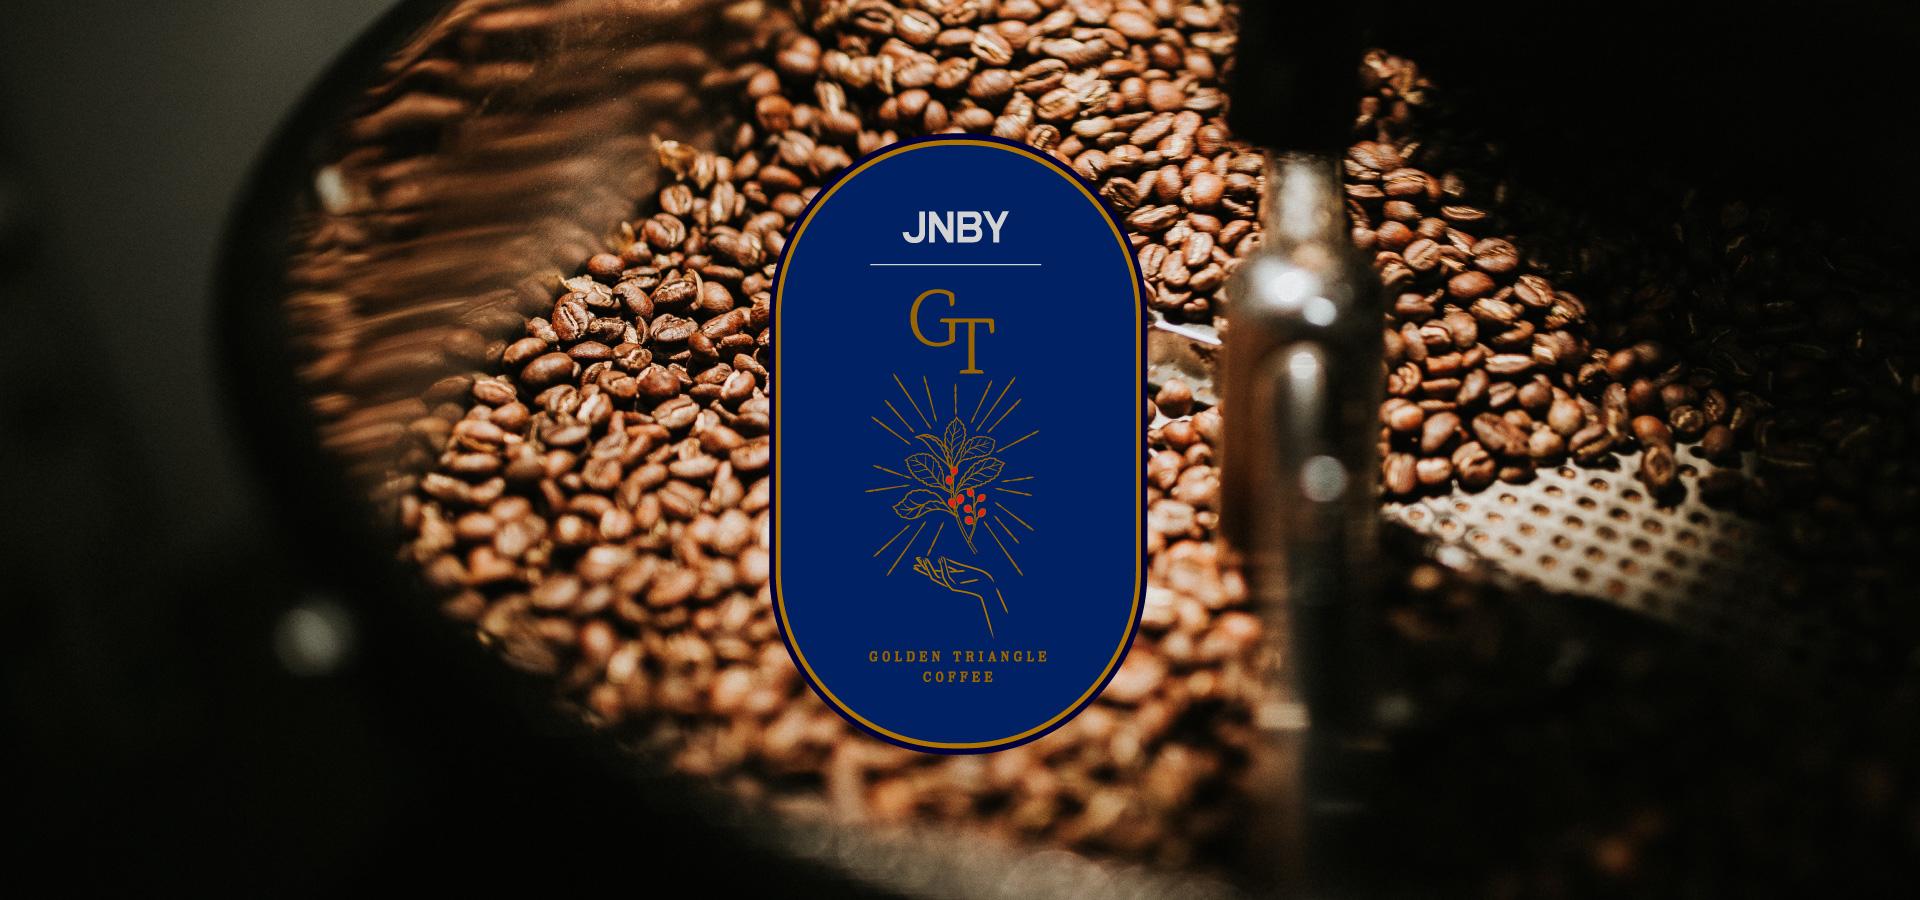 GT COFFEE